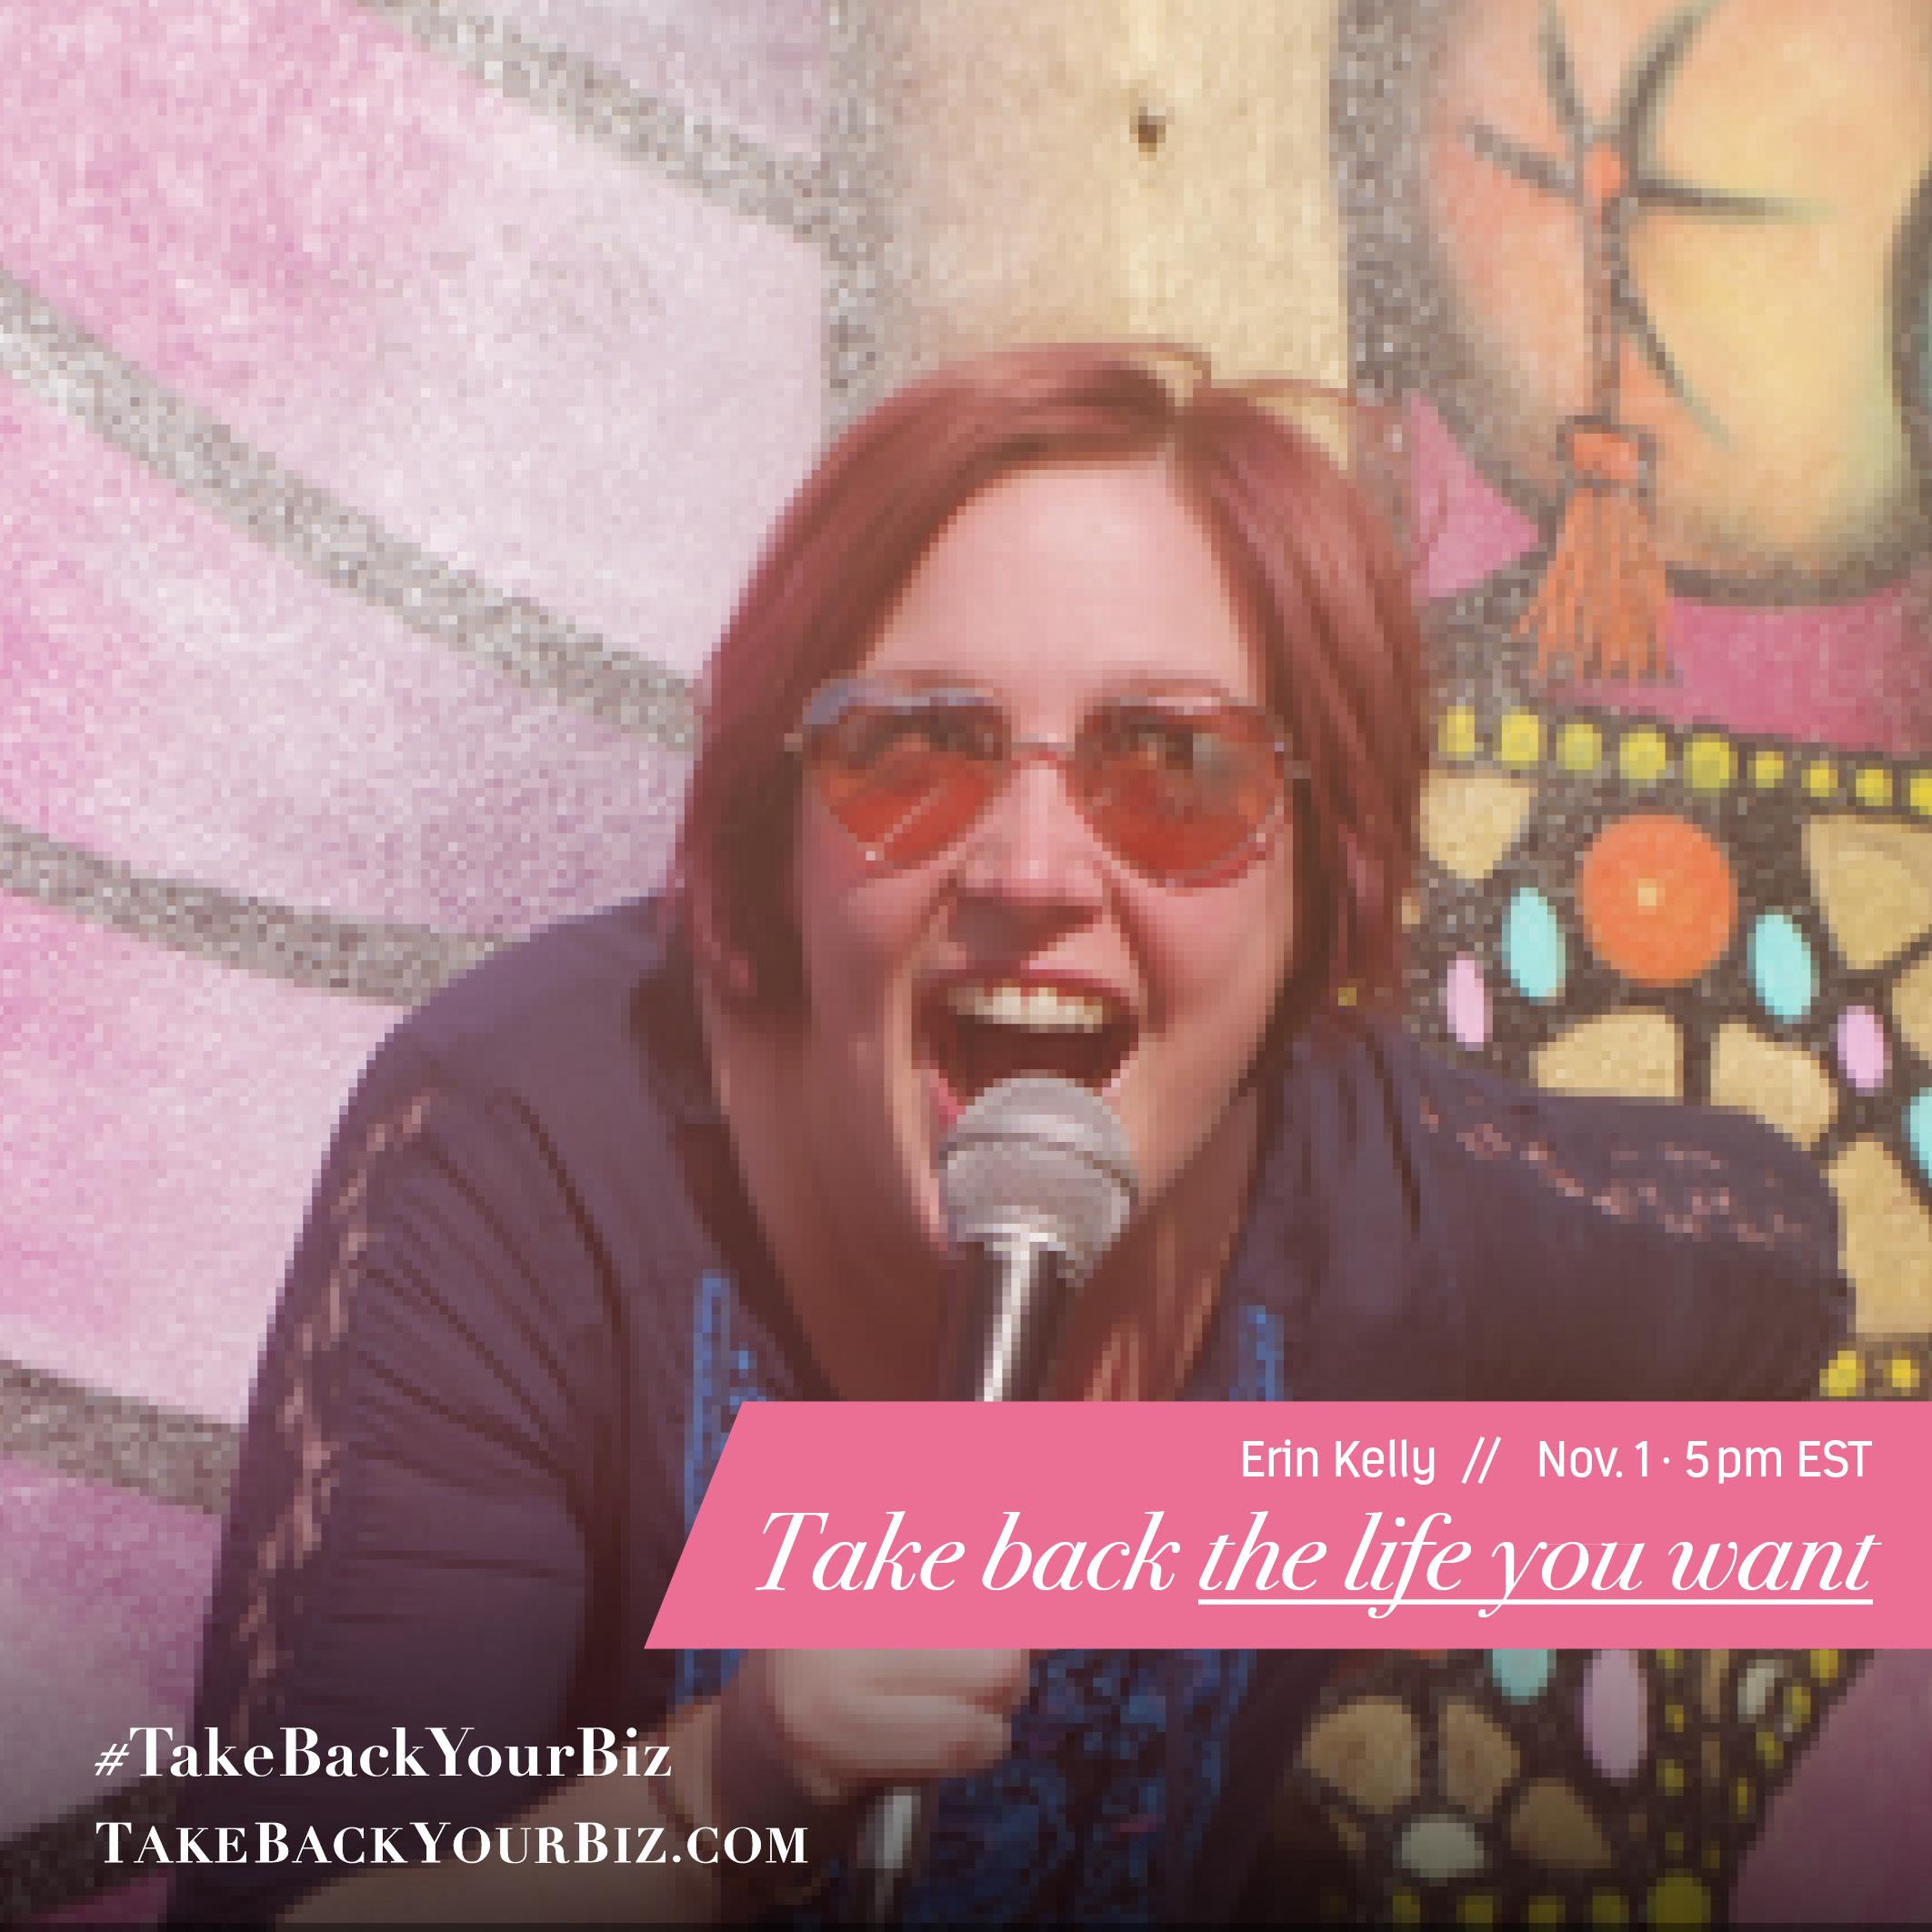 Take-Back-Your-Biz-Speakers-Erin-Kelly-Member-Vault